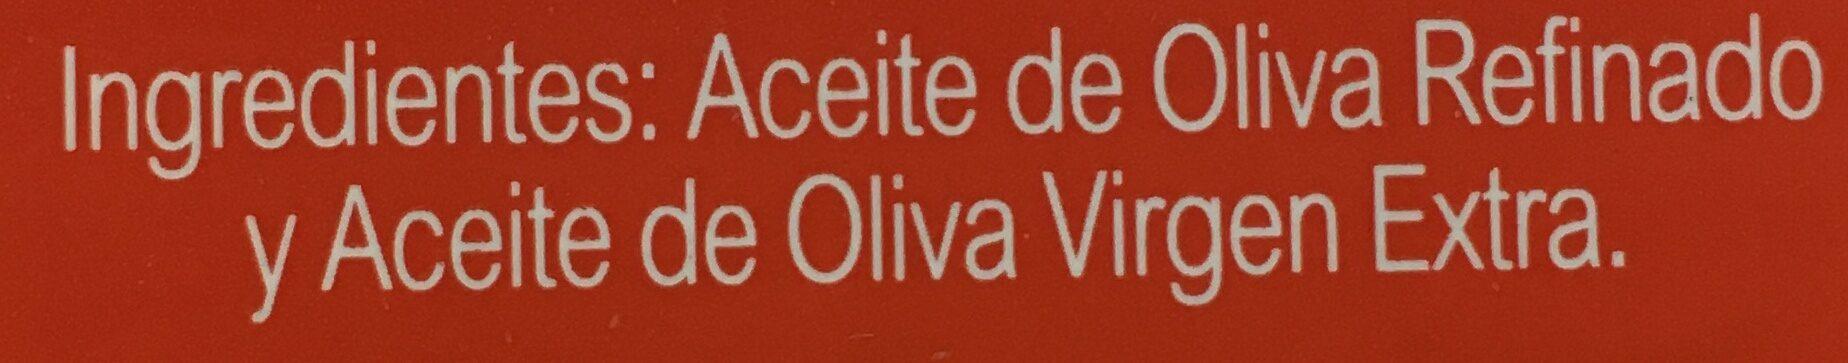 Aceite de oliva suave 0,4º bidón 3 l - Ingrediënten - es